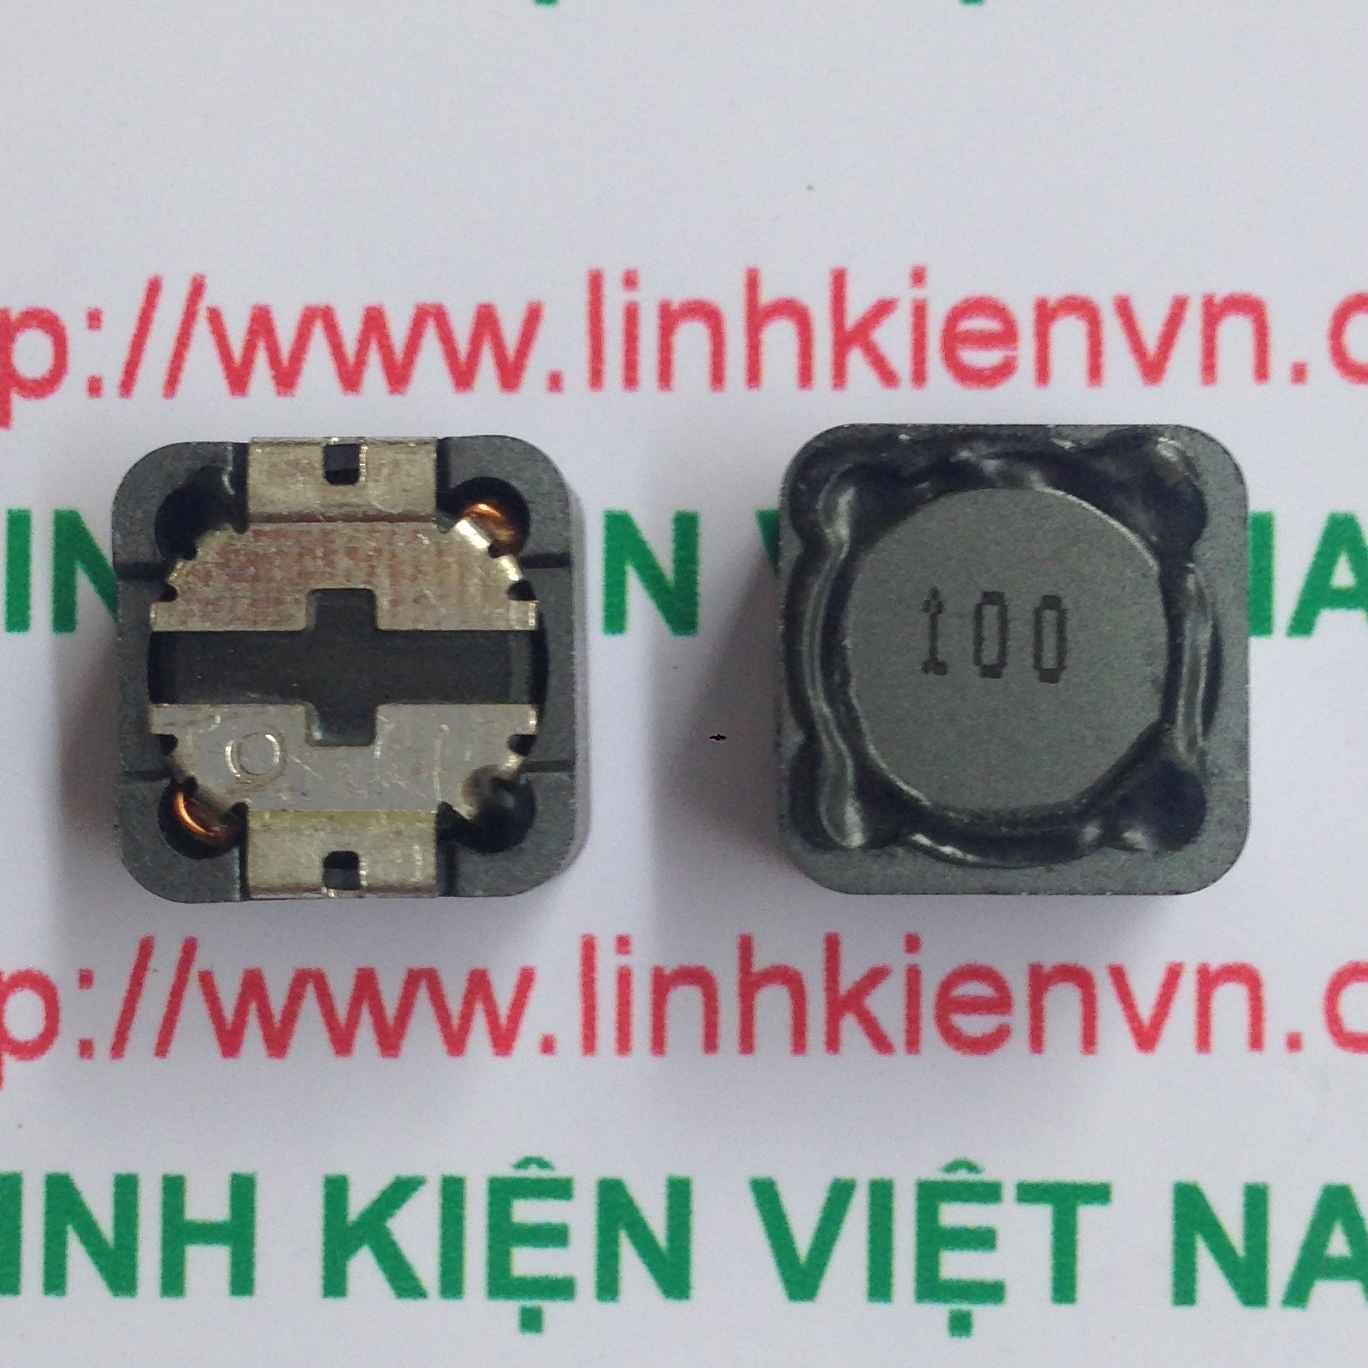 CUỘN CẢM DÁN 12x12x7mm 3A - 10uH - B10H15